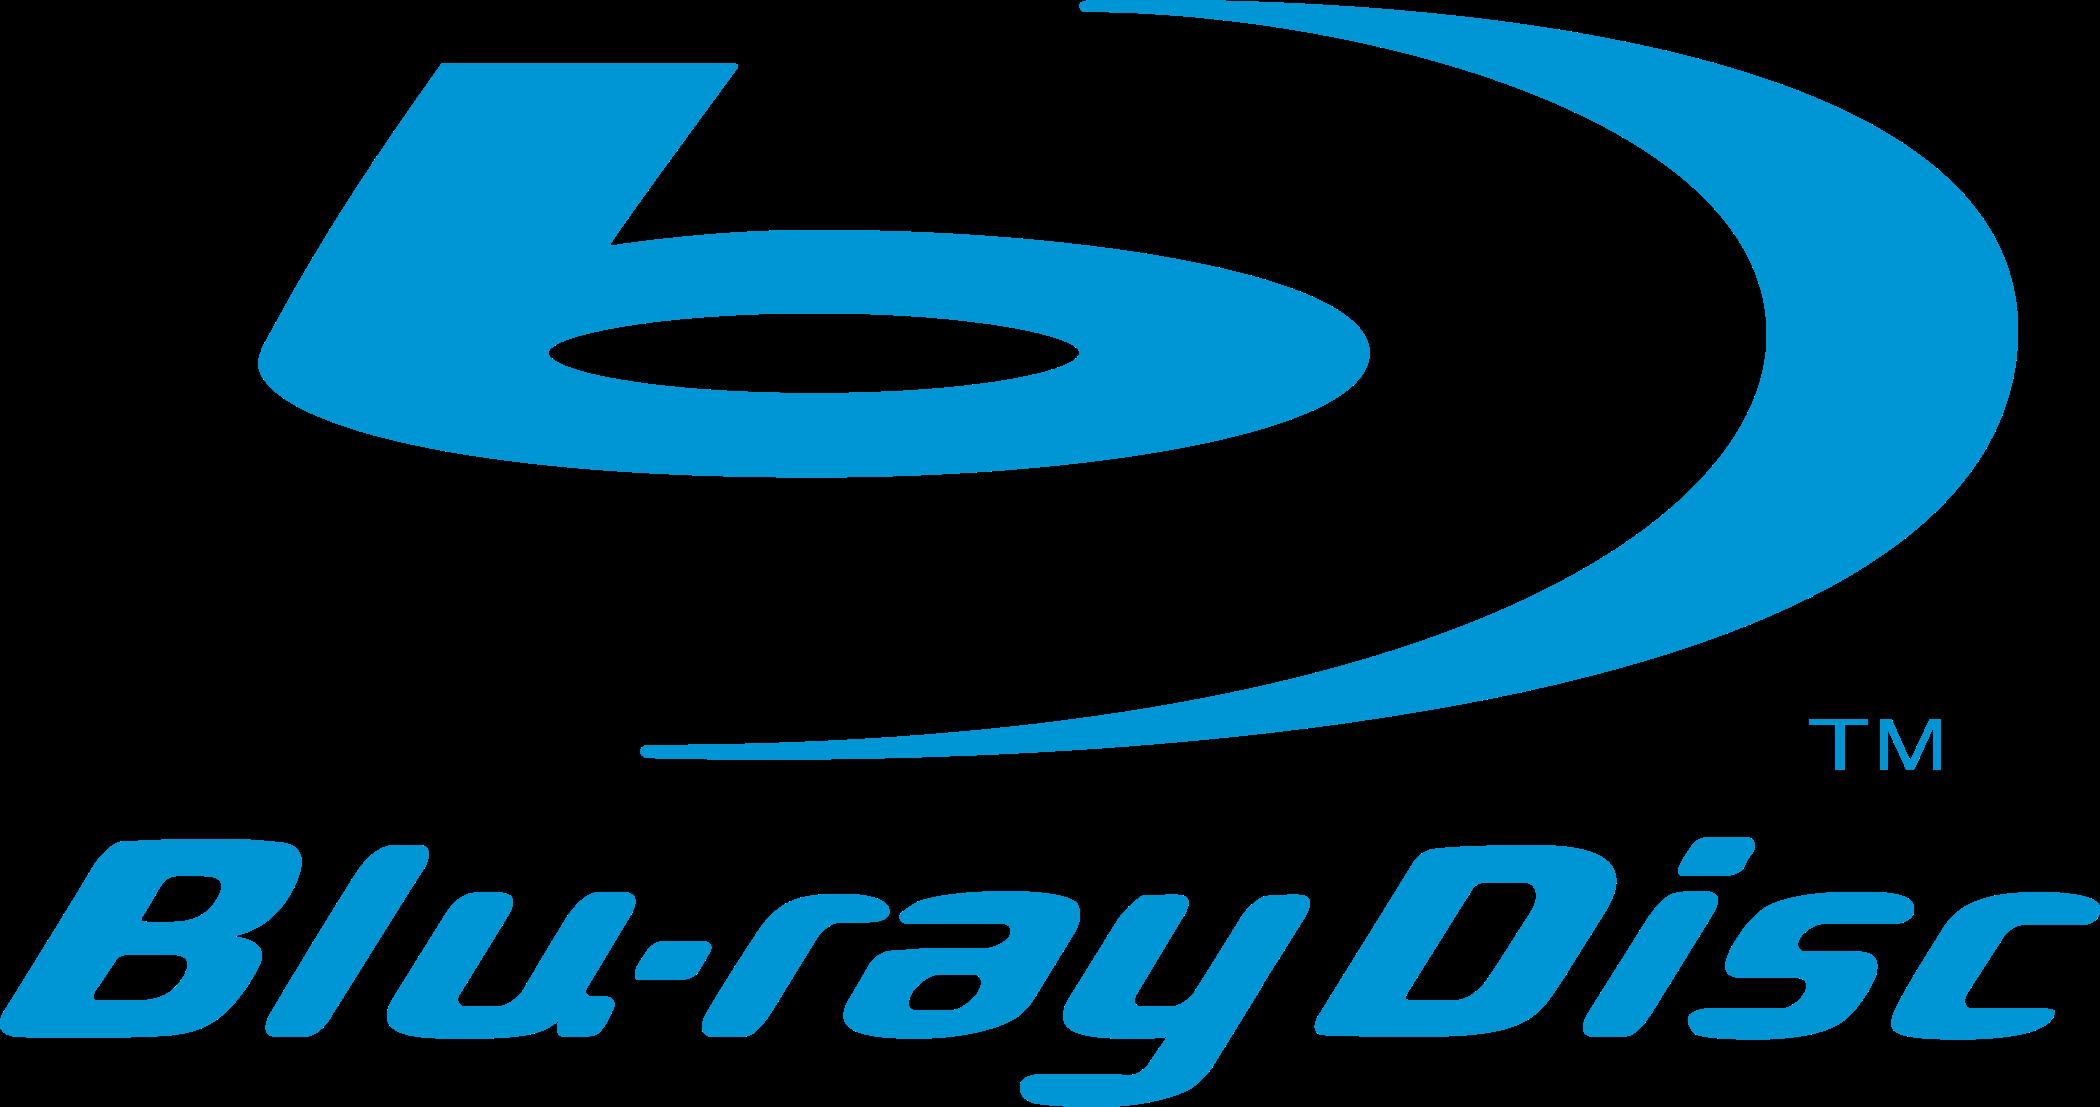 blu-ray-logo-1